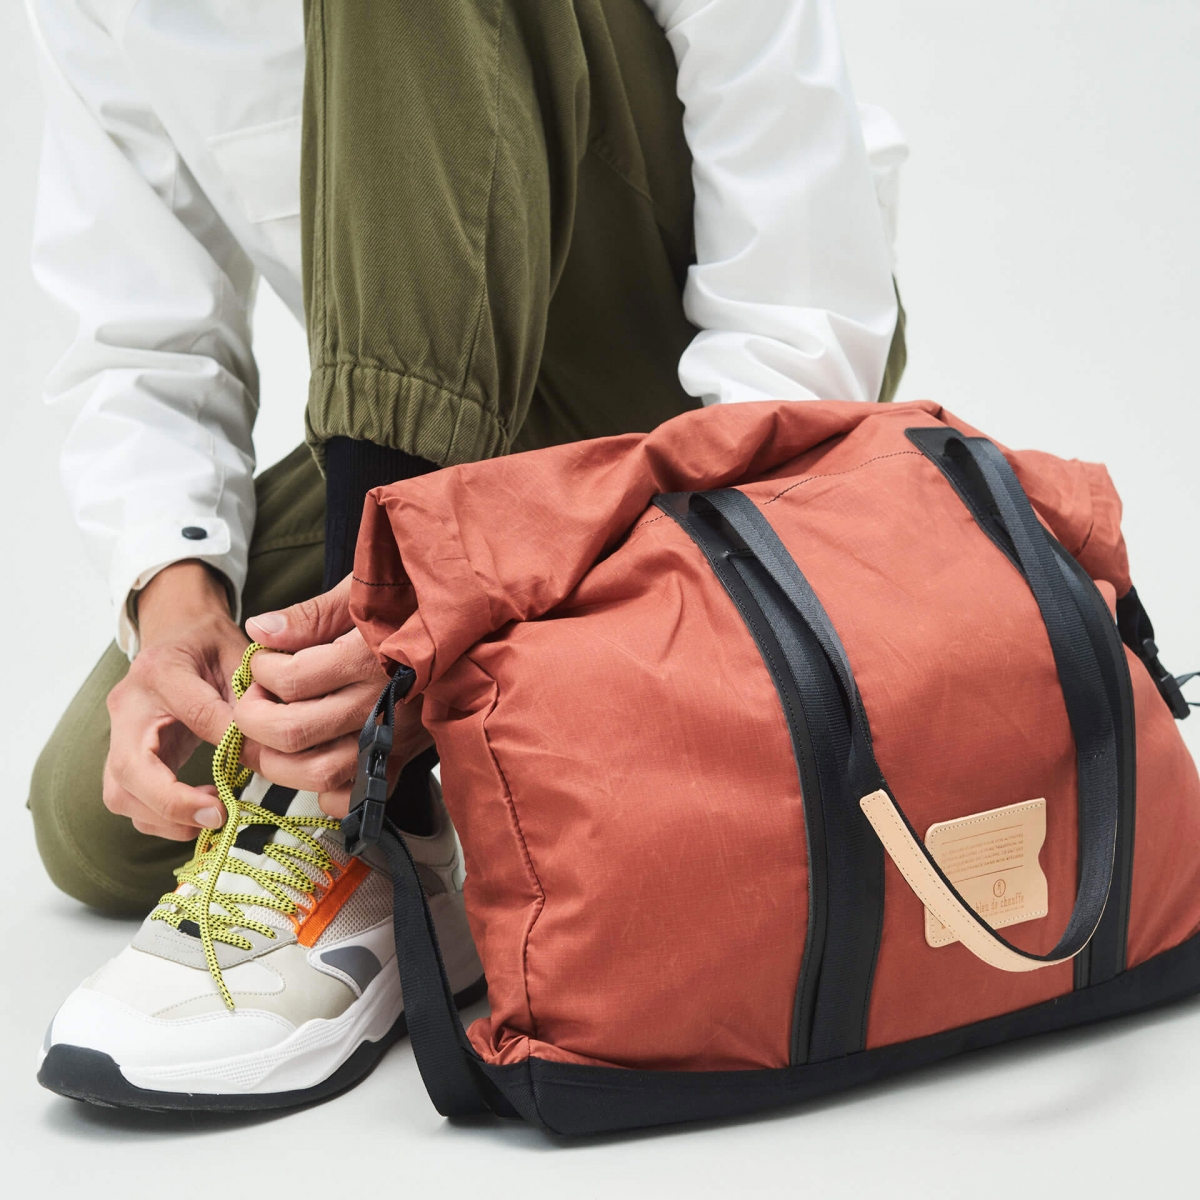 15L Barda Tote bag - Burgundy (image n°6)